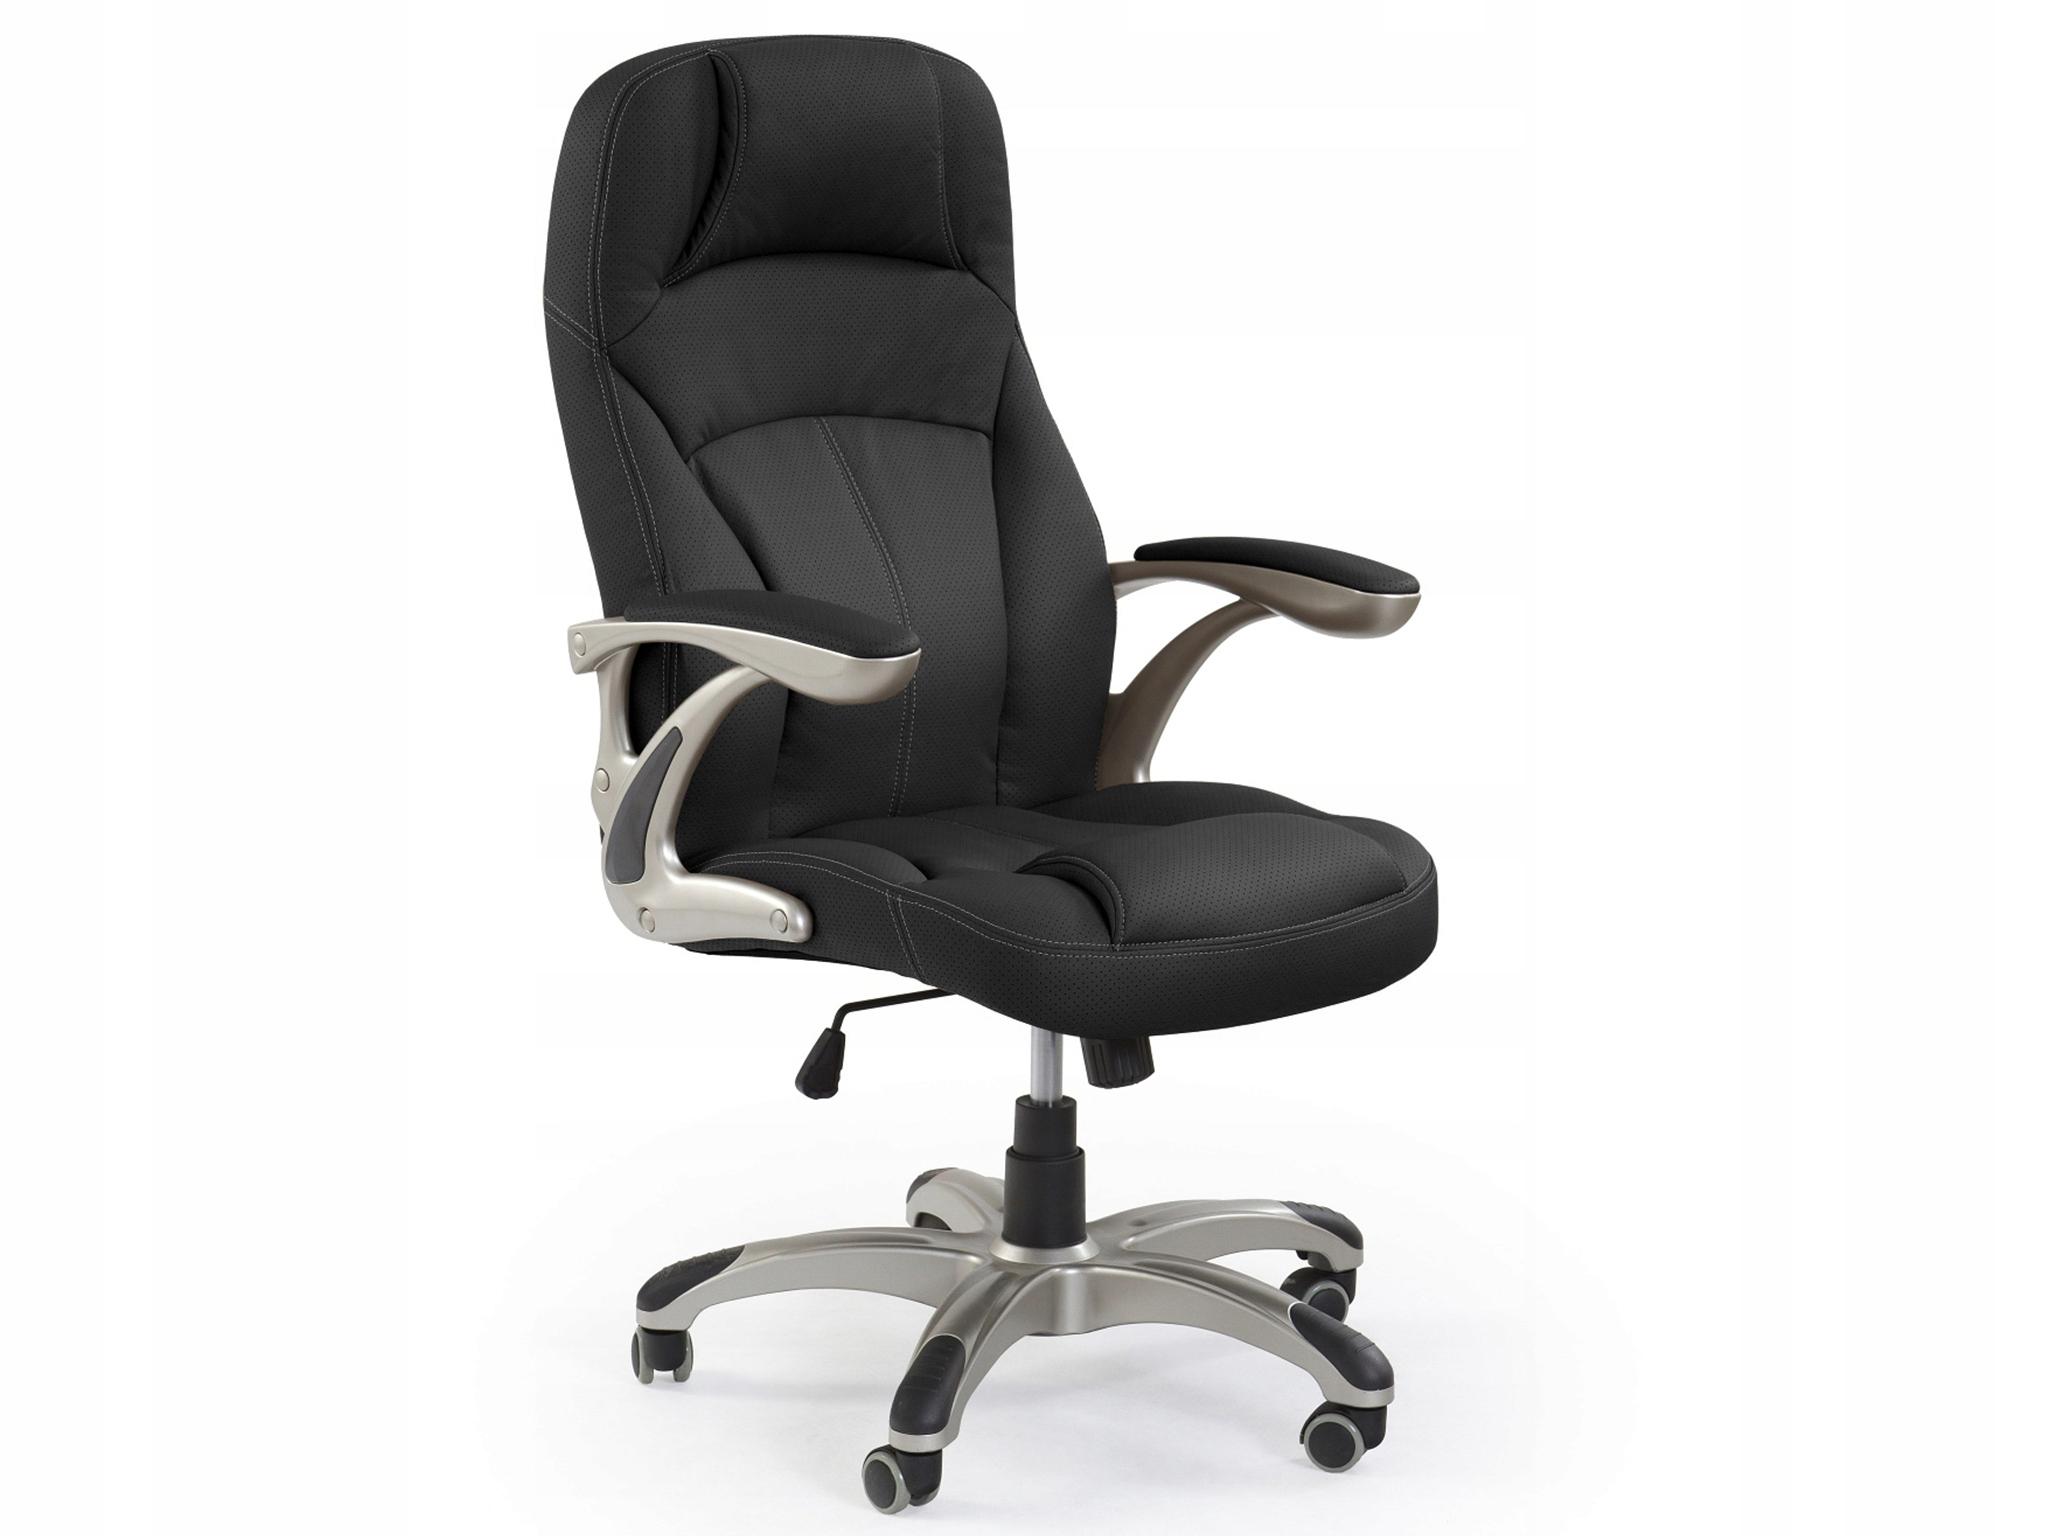 Stolička gabinetowy CARLOS čierne stoličky biuroHALMAR